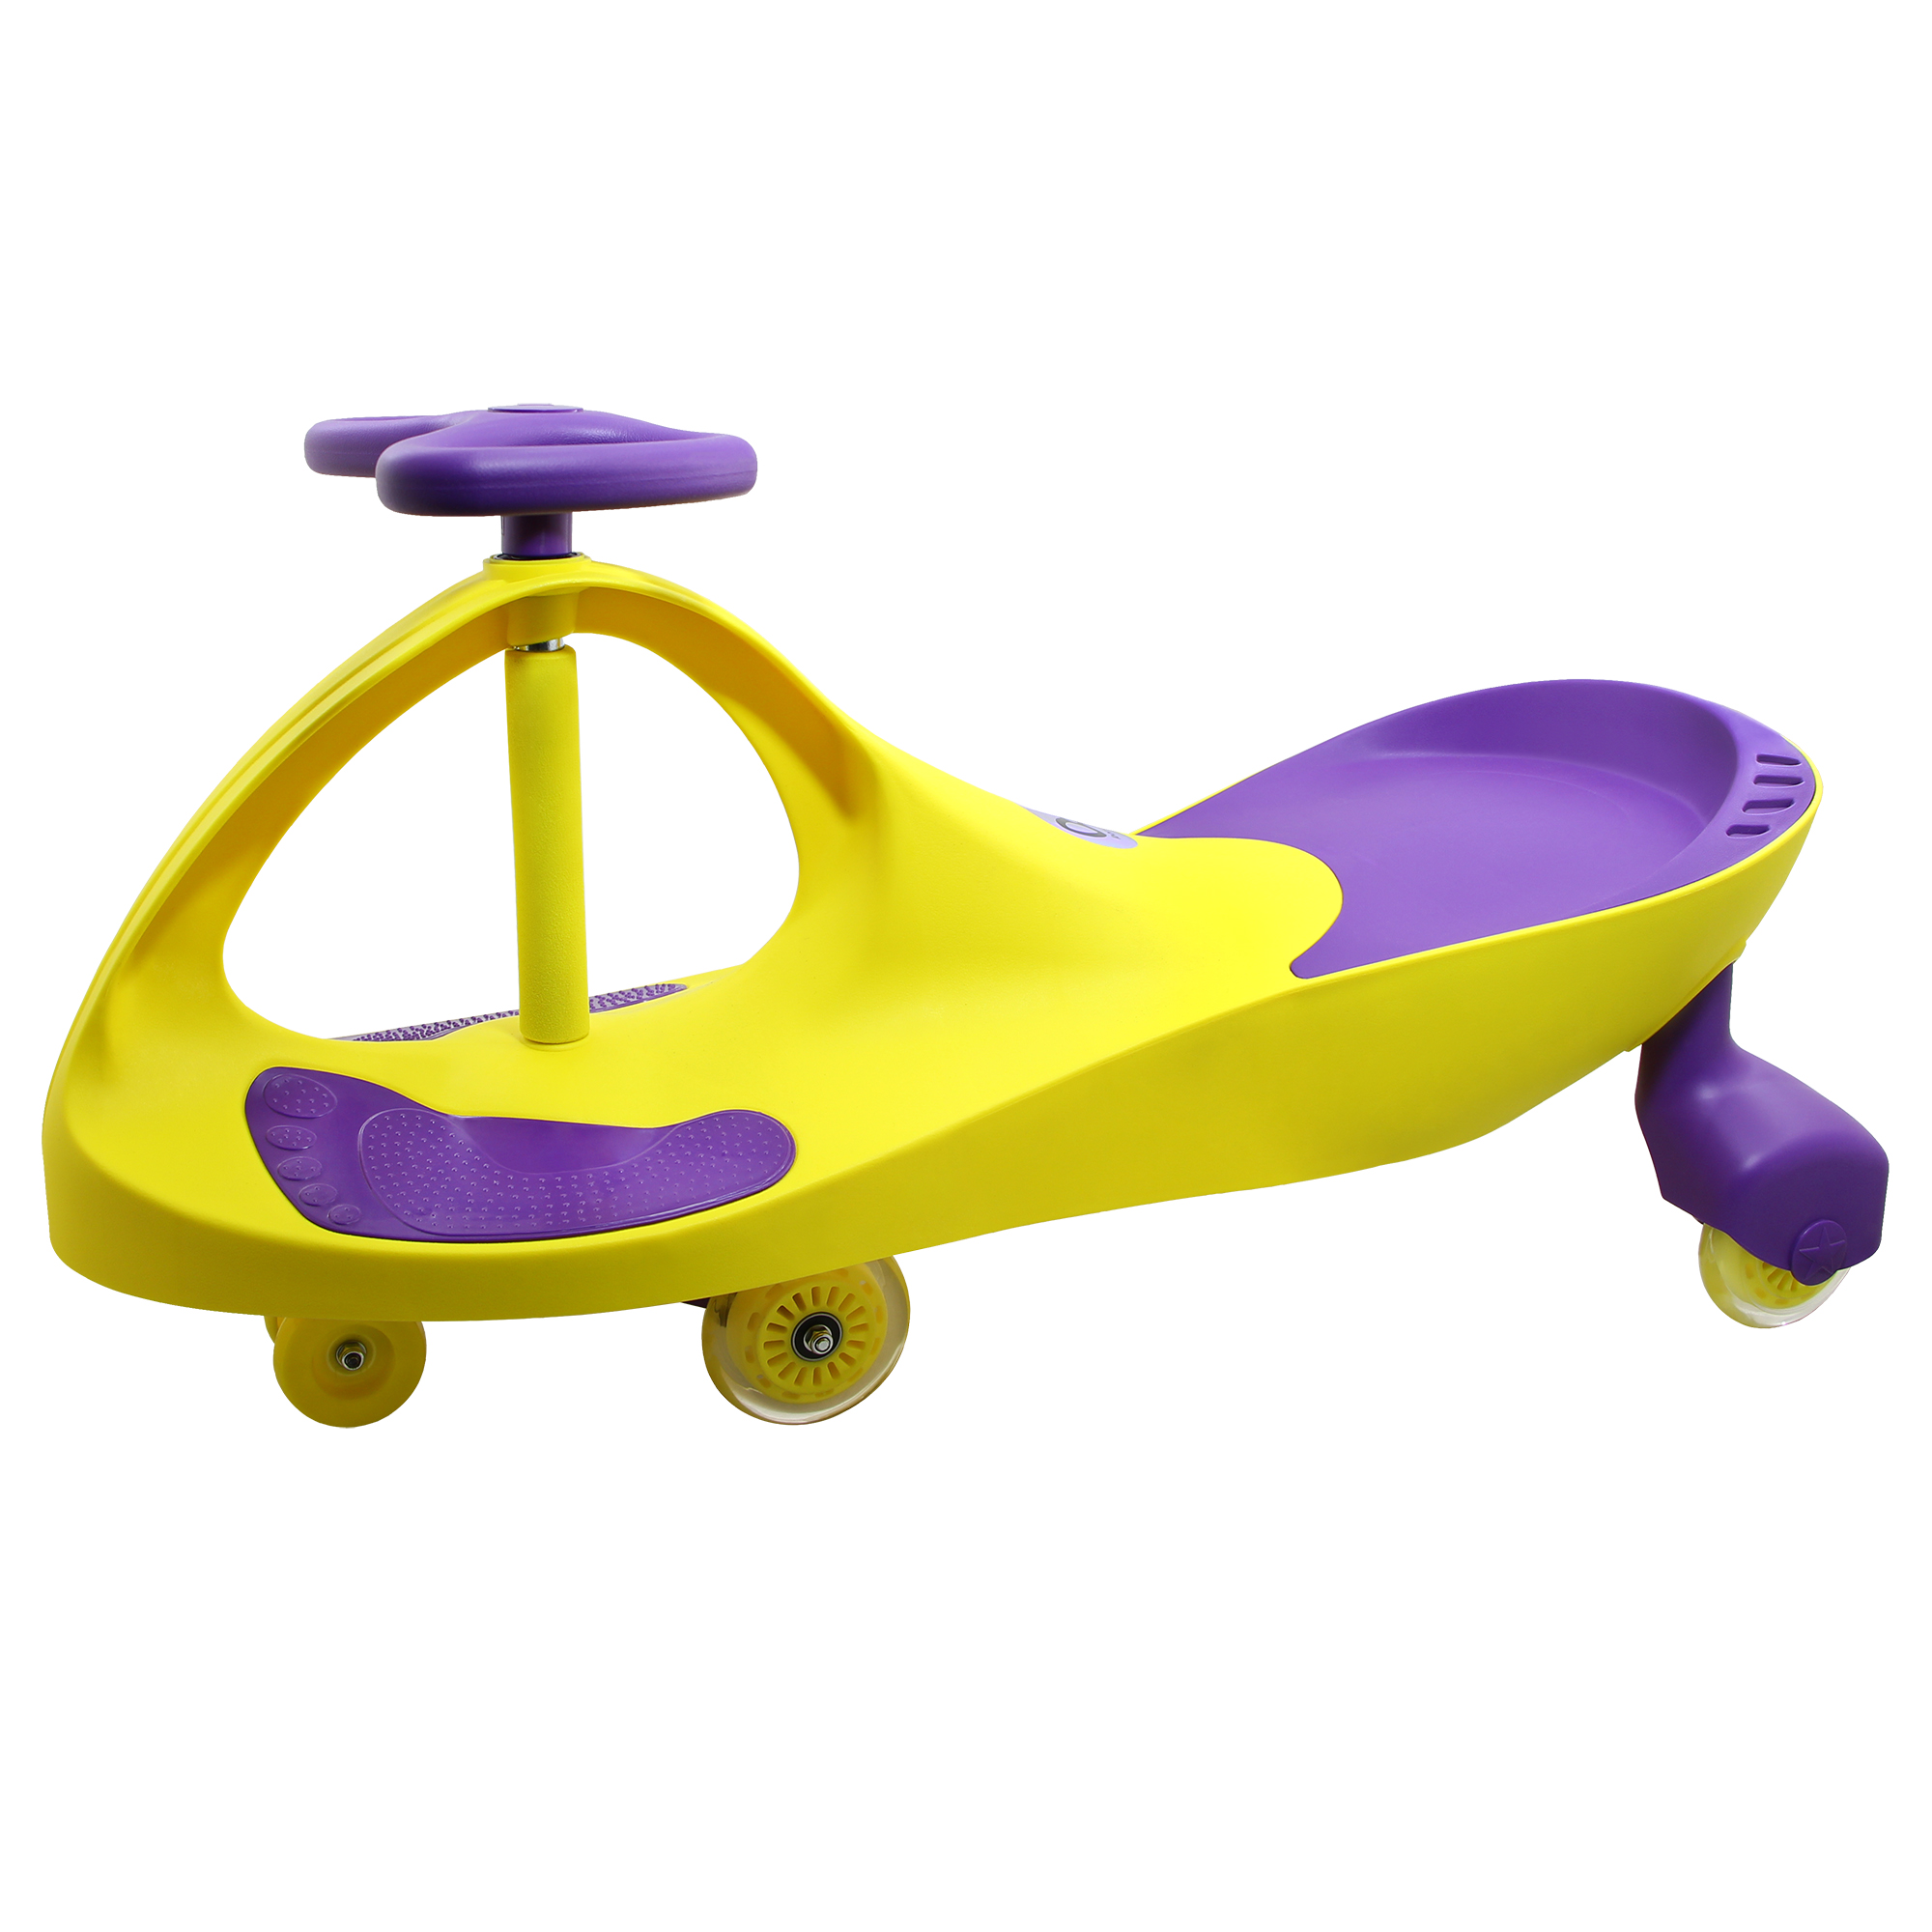 Loopcar Yellow Purple 02